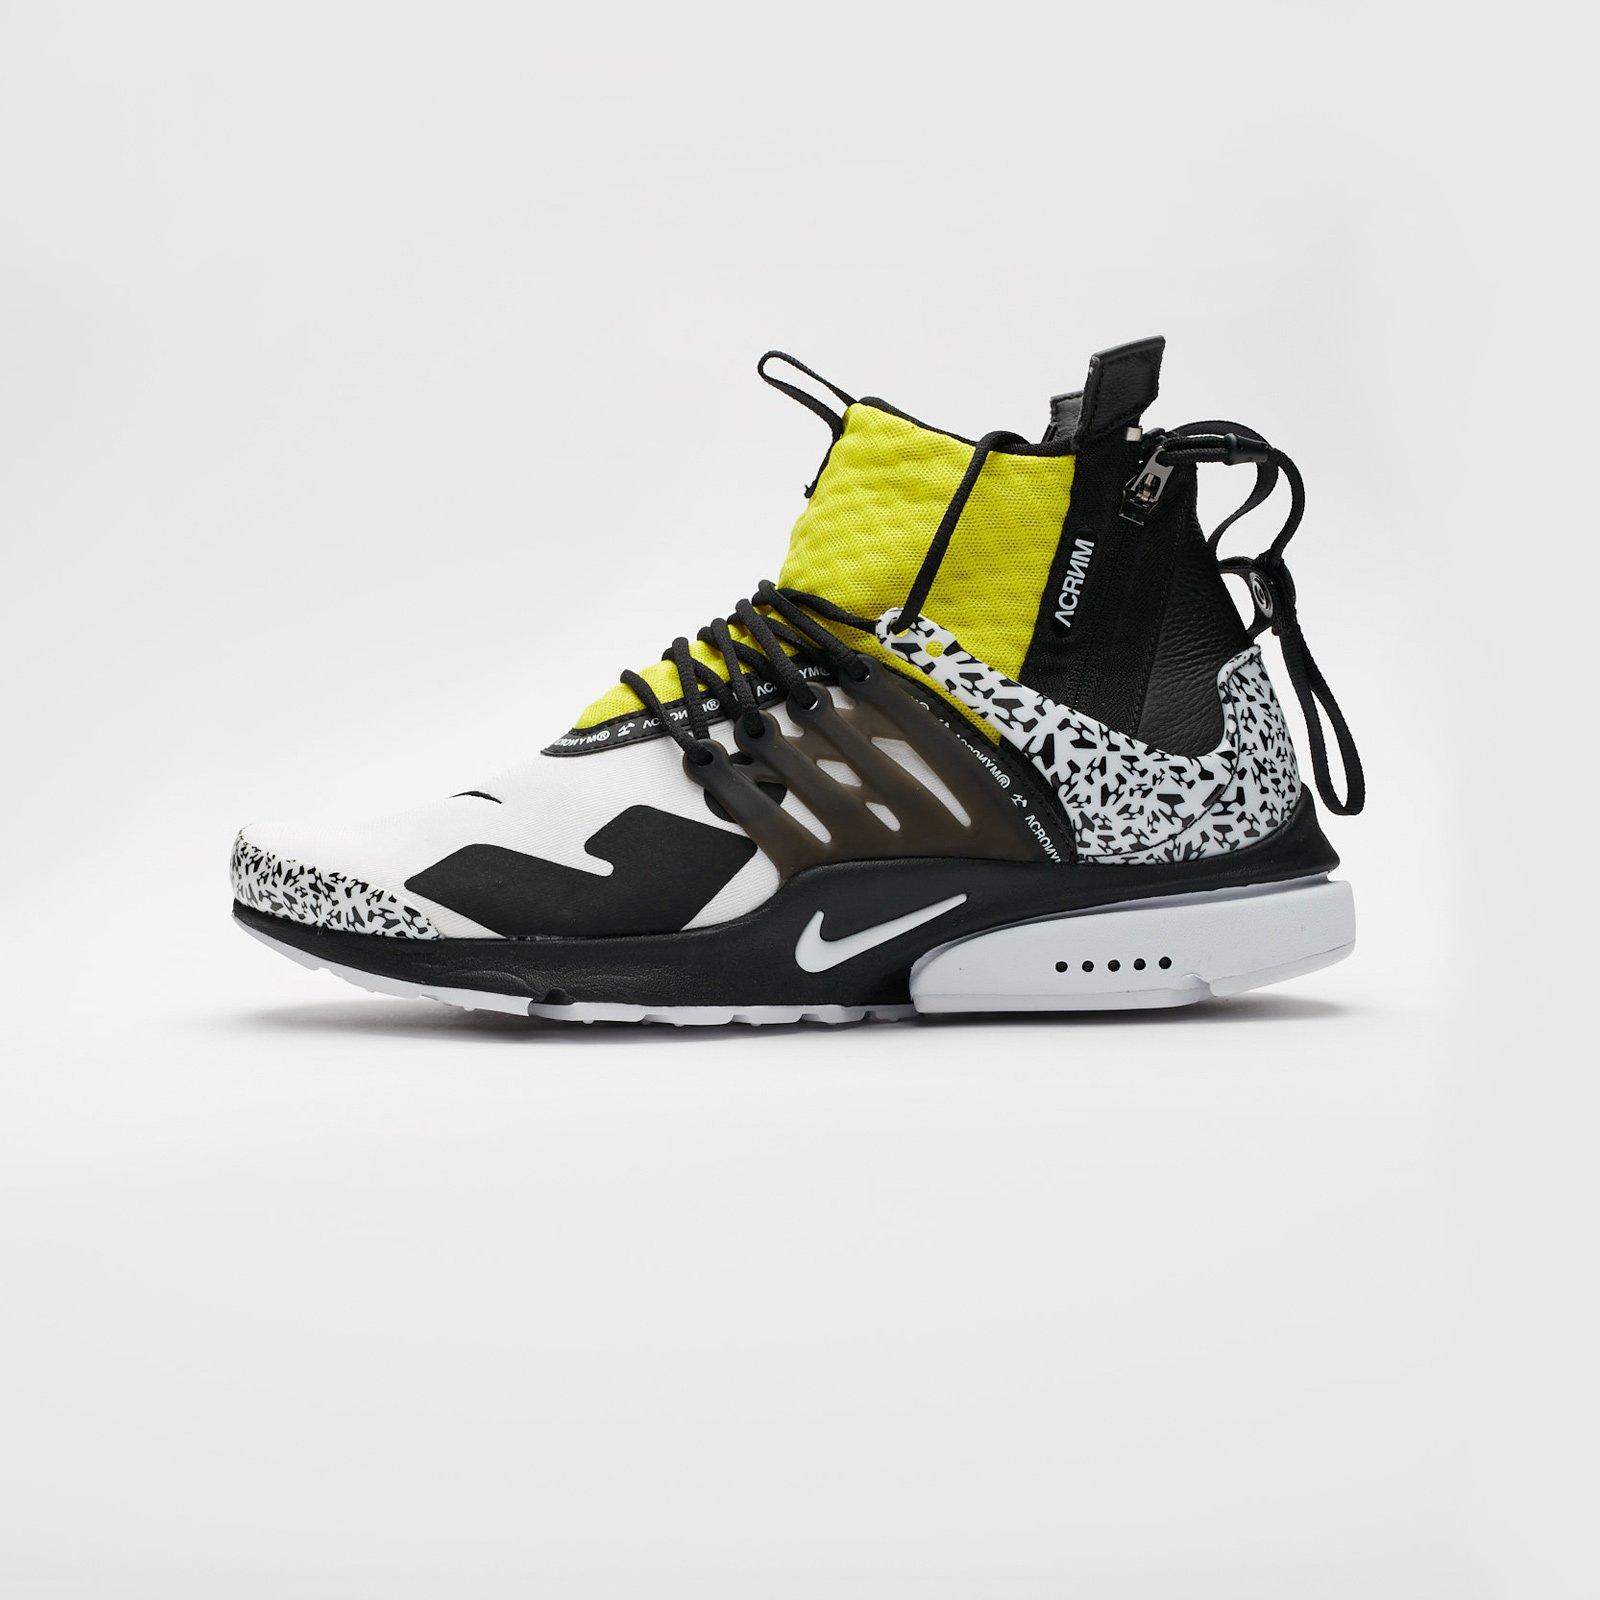 abbba3d6e40c Nike Air Presto Mid x Acronym - Ah7832-100 - Sneakersnstuff ...